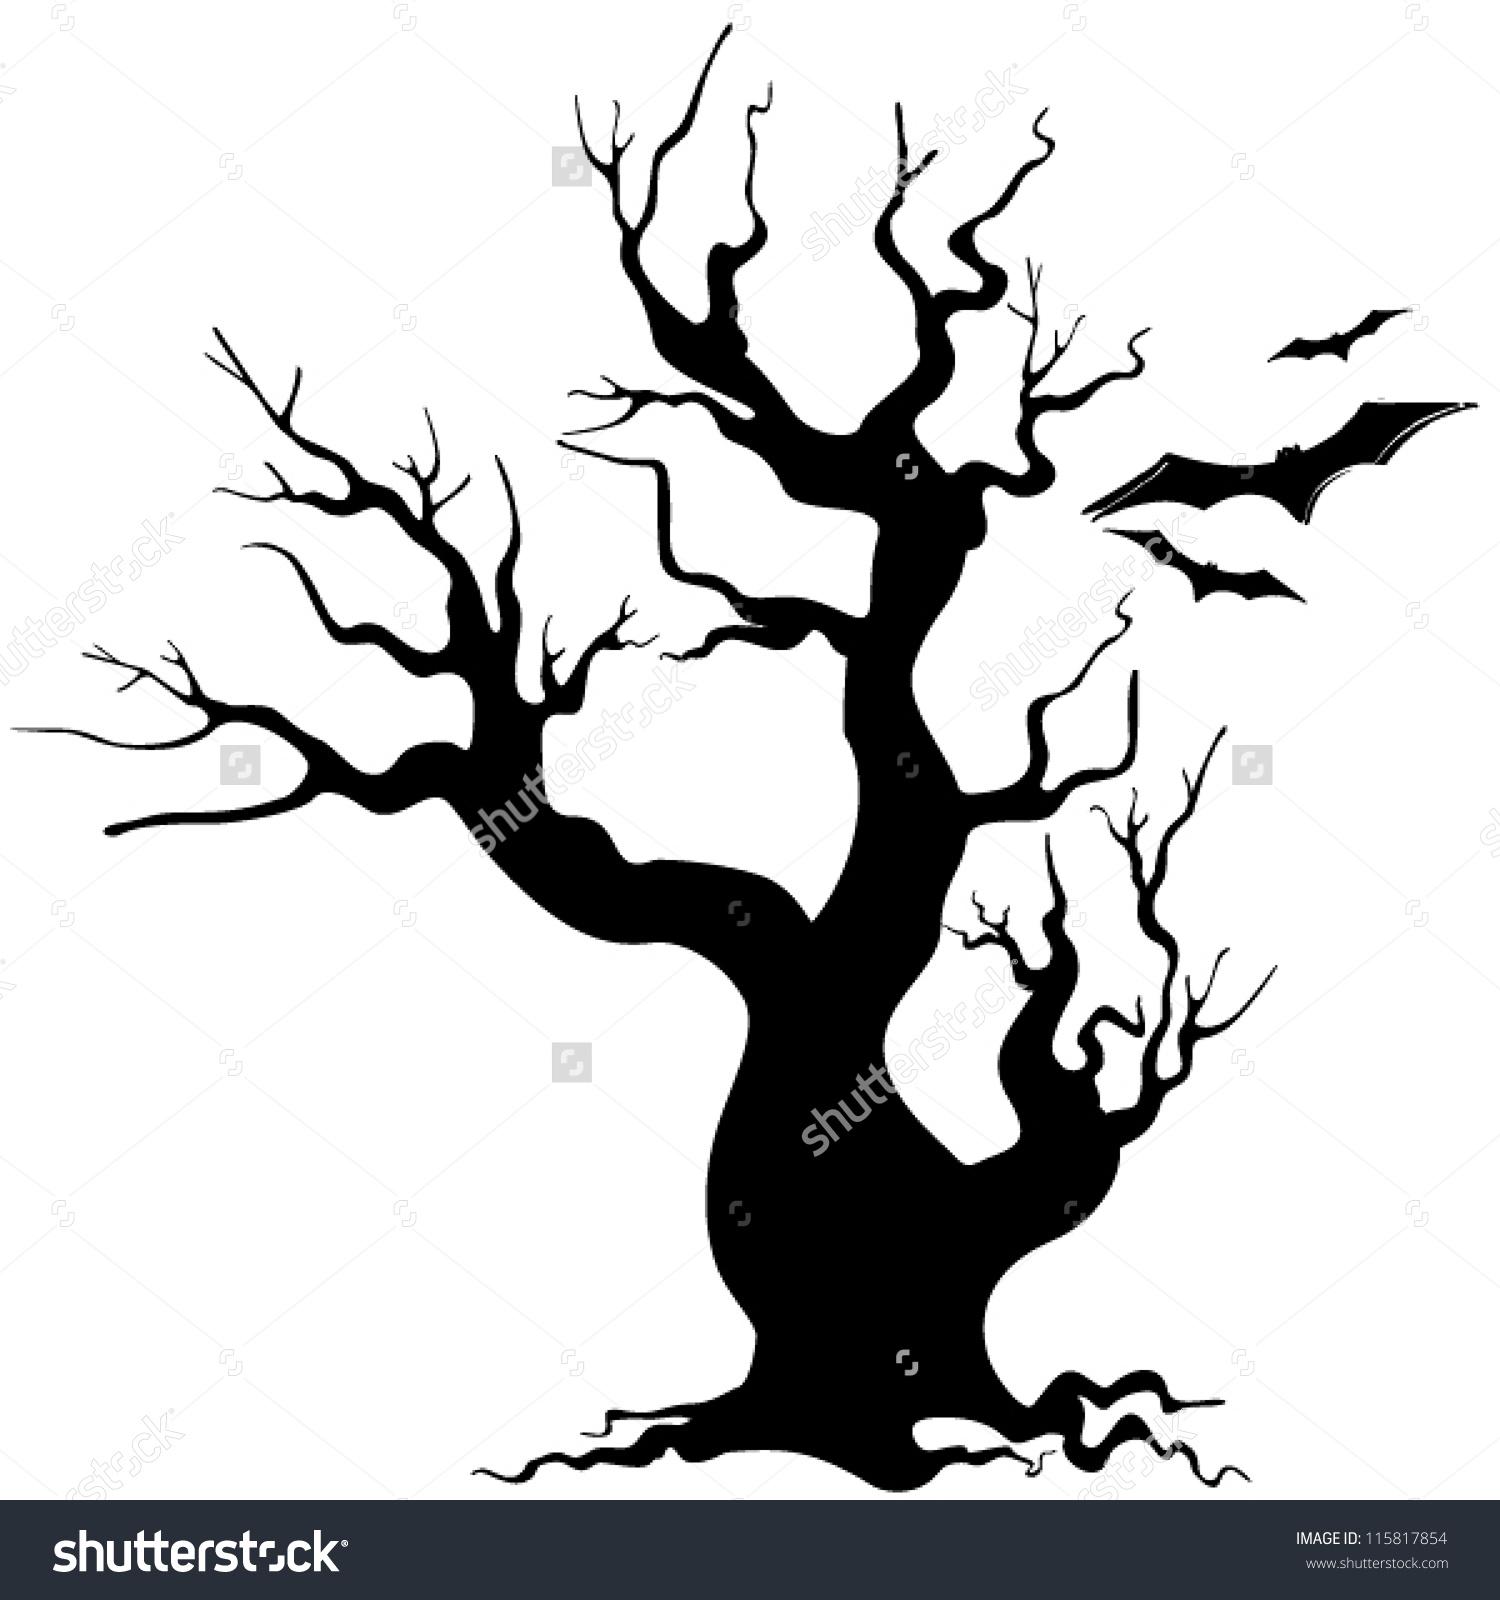 1500x1600 Halloween Tree Silhouette Clipart